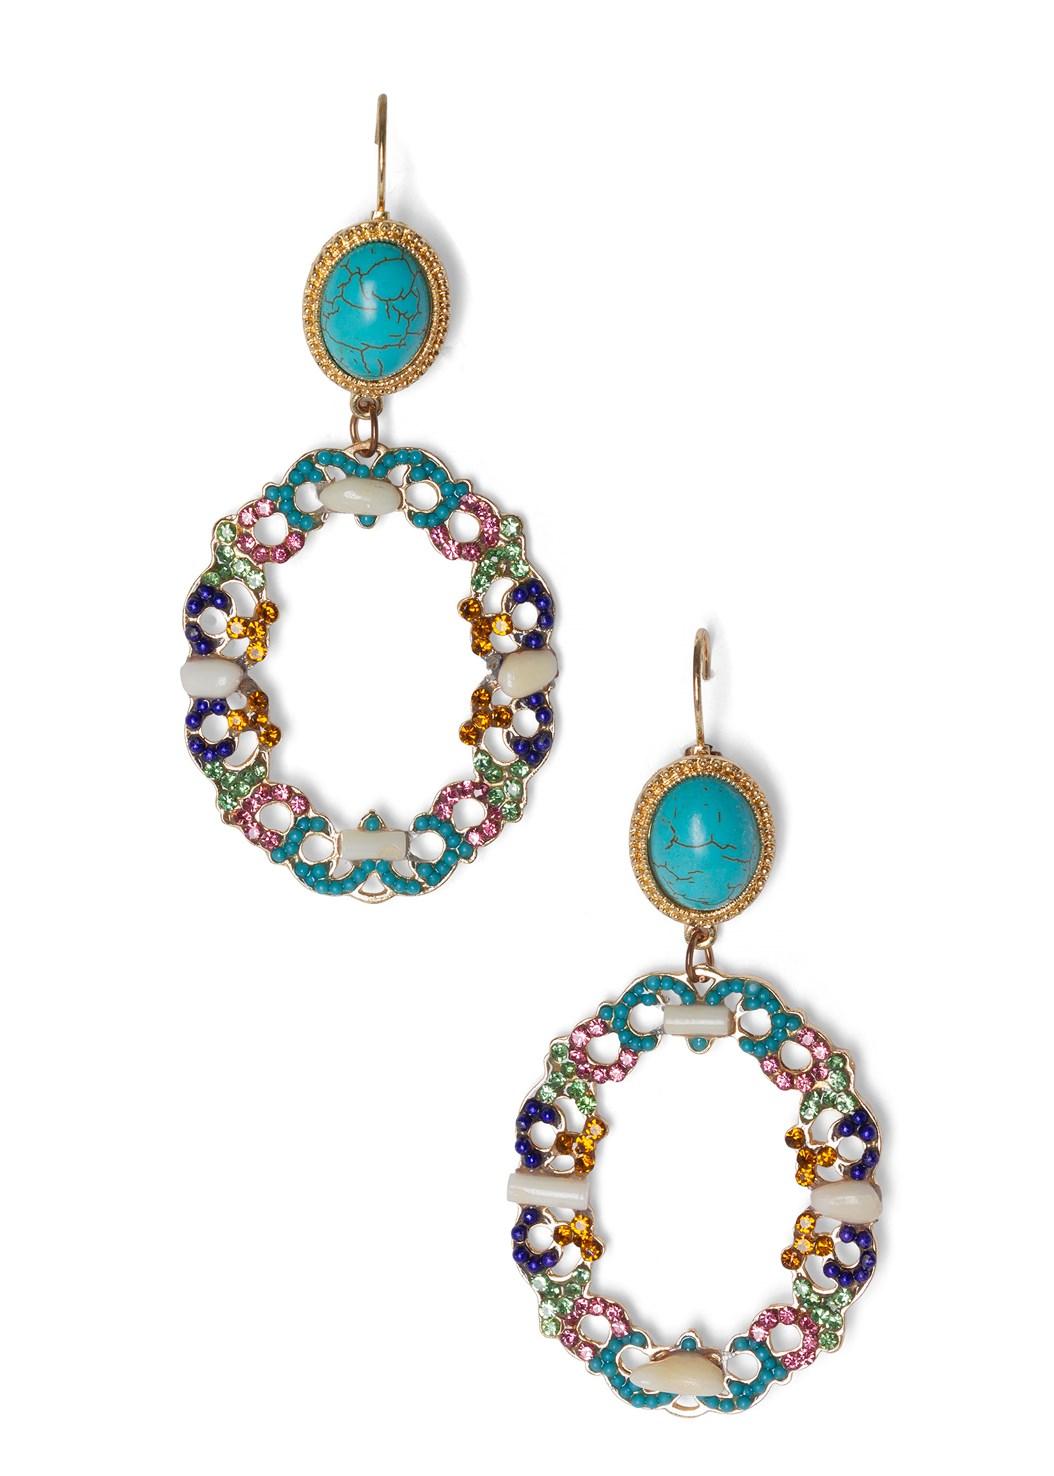 Beaded Statement Earrings,Printed Embellished Dress